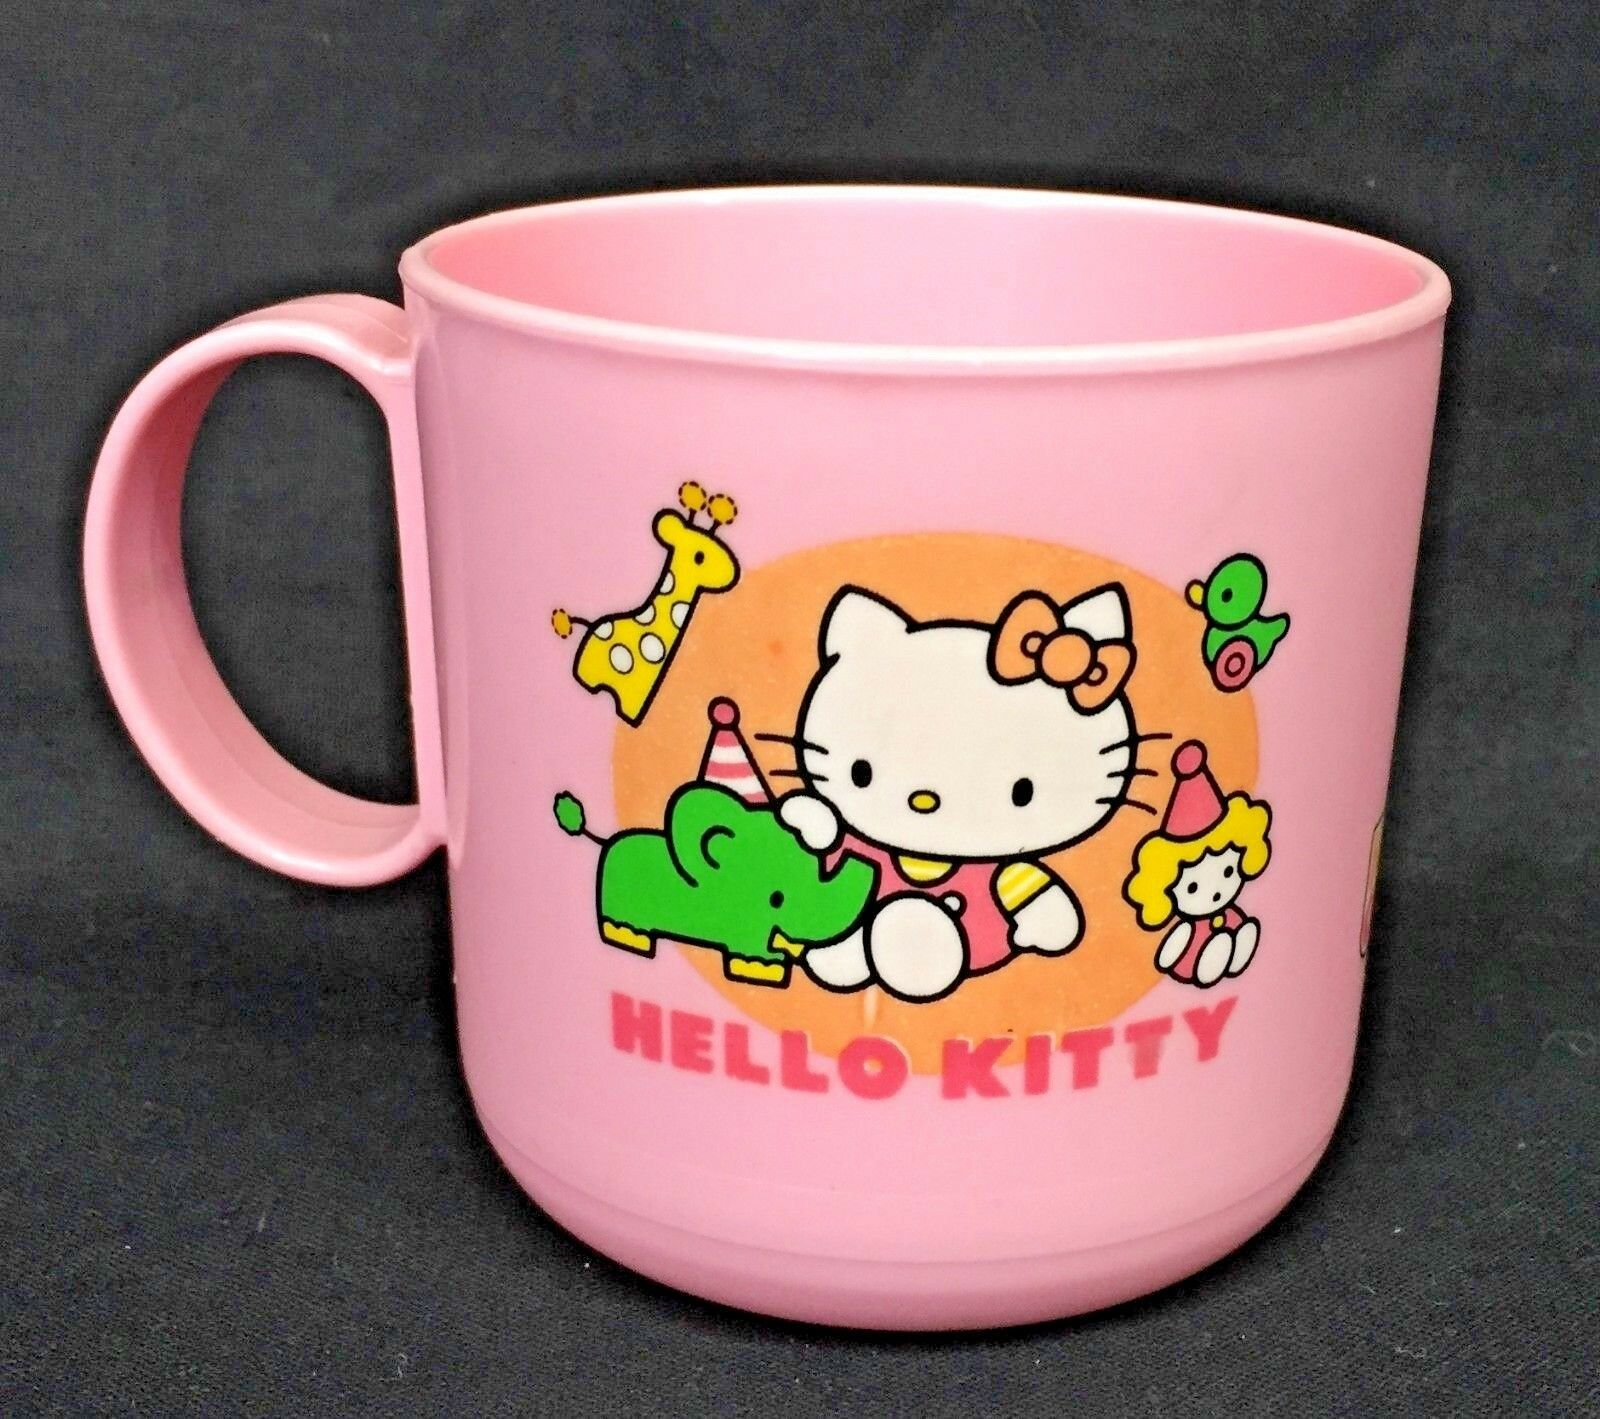 Hello Kitty Japan limited Mug Cup Sanrio Nostalgic item collection 3 New